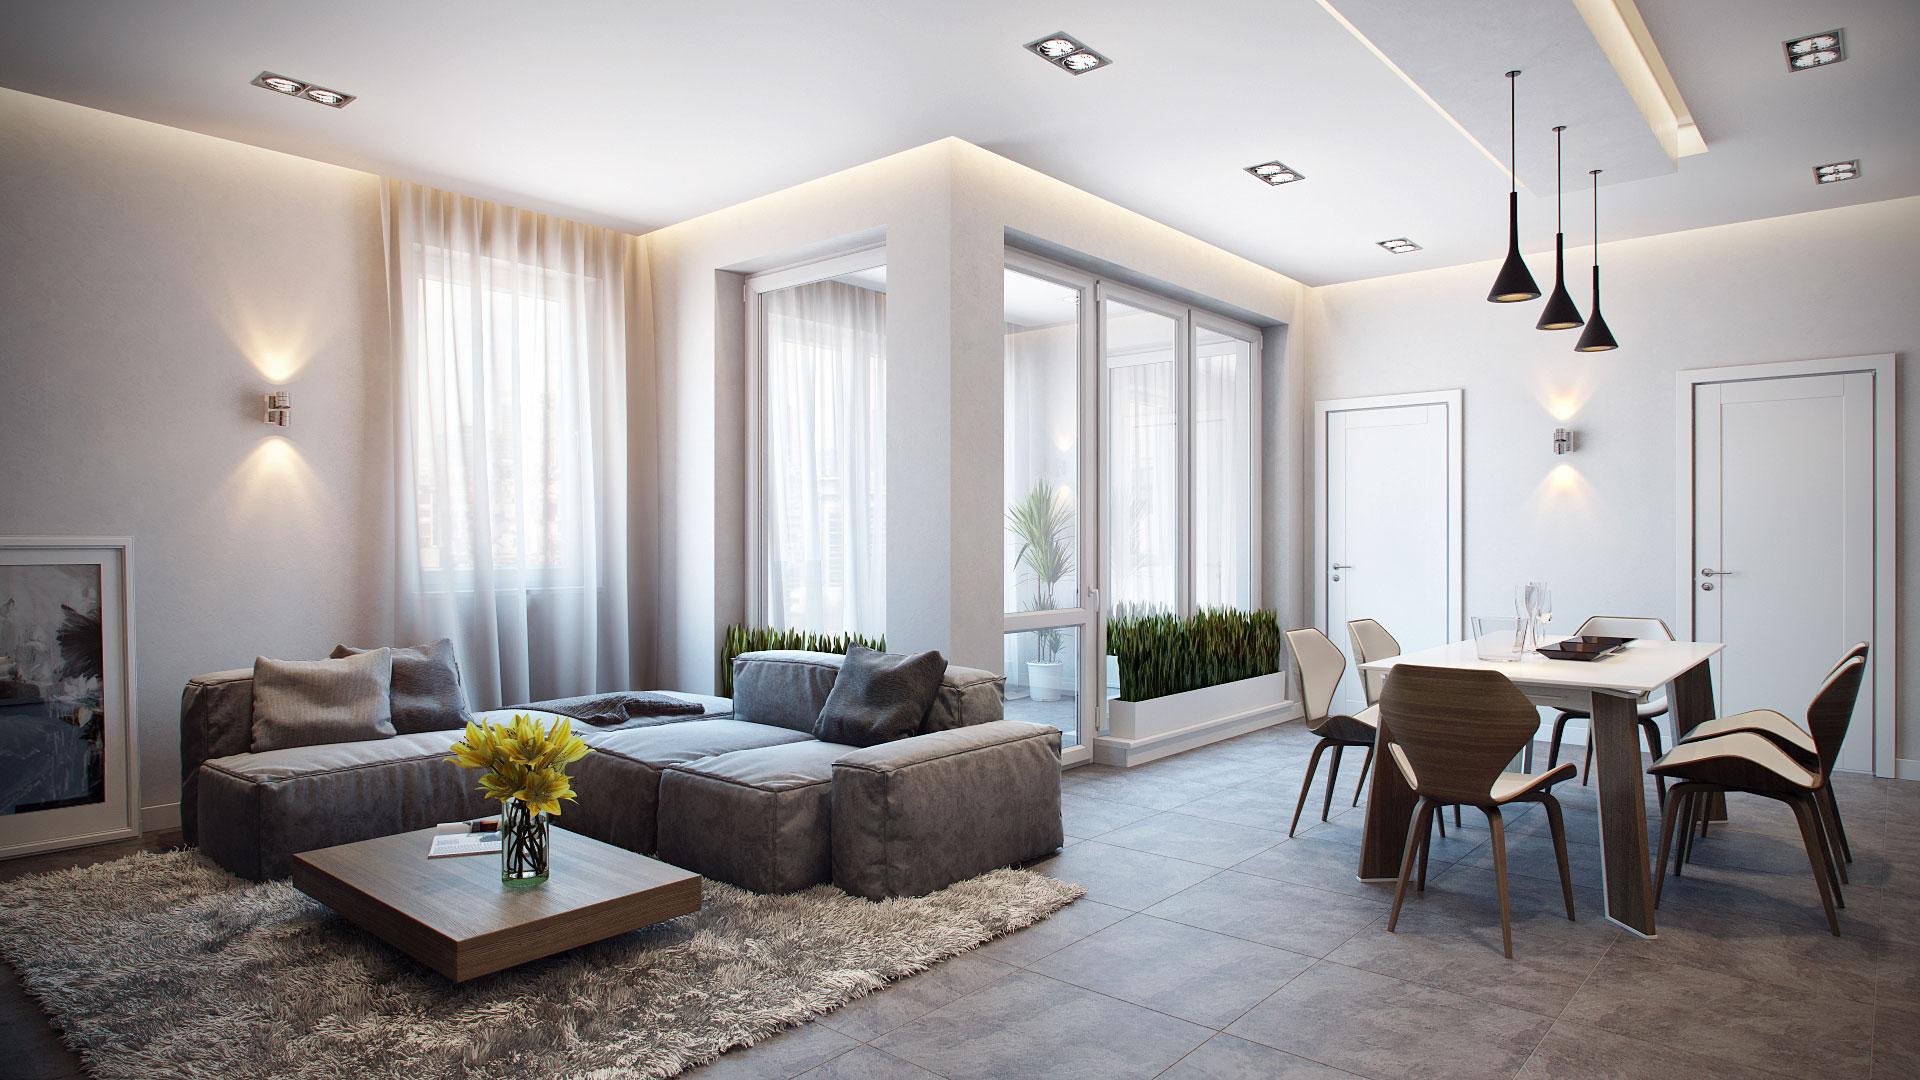 Stylish And Modern Apartment Interior Design